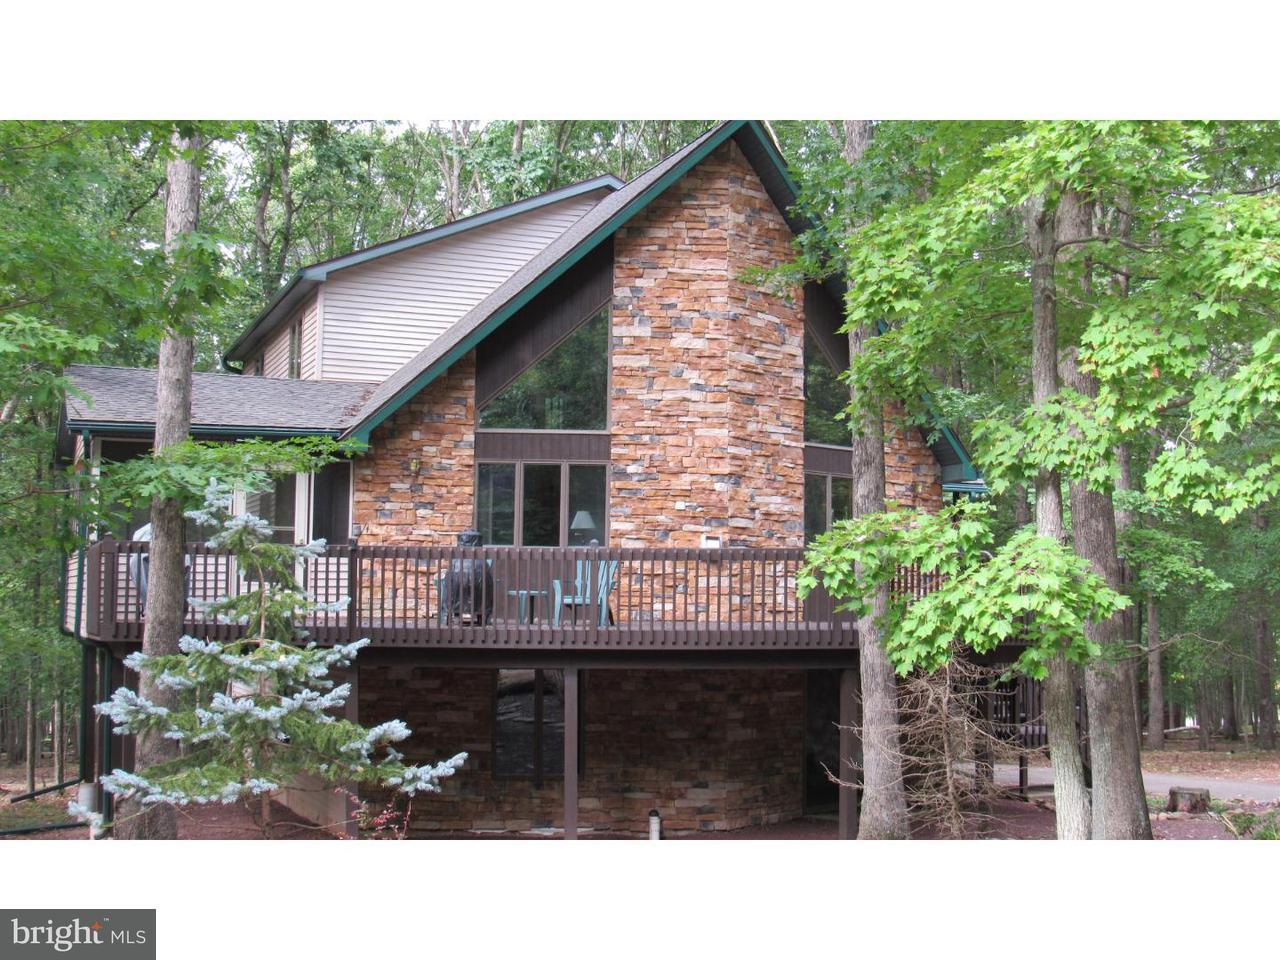 Single Family Home for Sale at 12 SHENANGO Hazleton, Pennsylvania 18202 United States